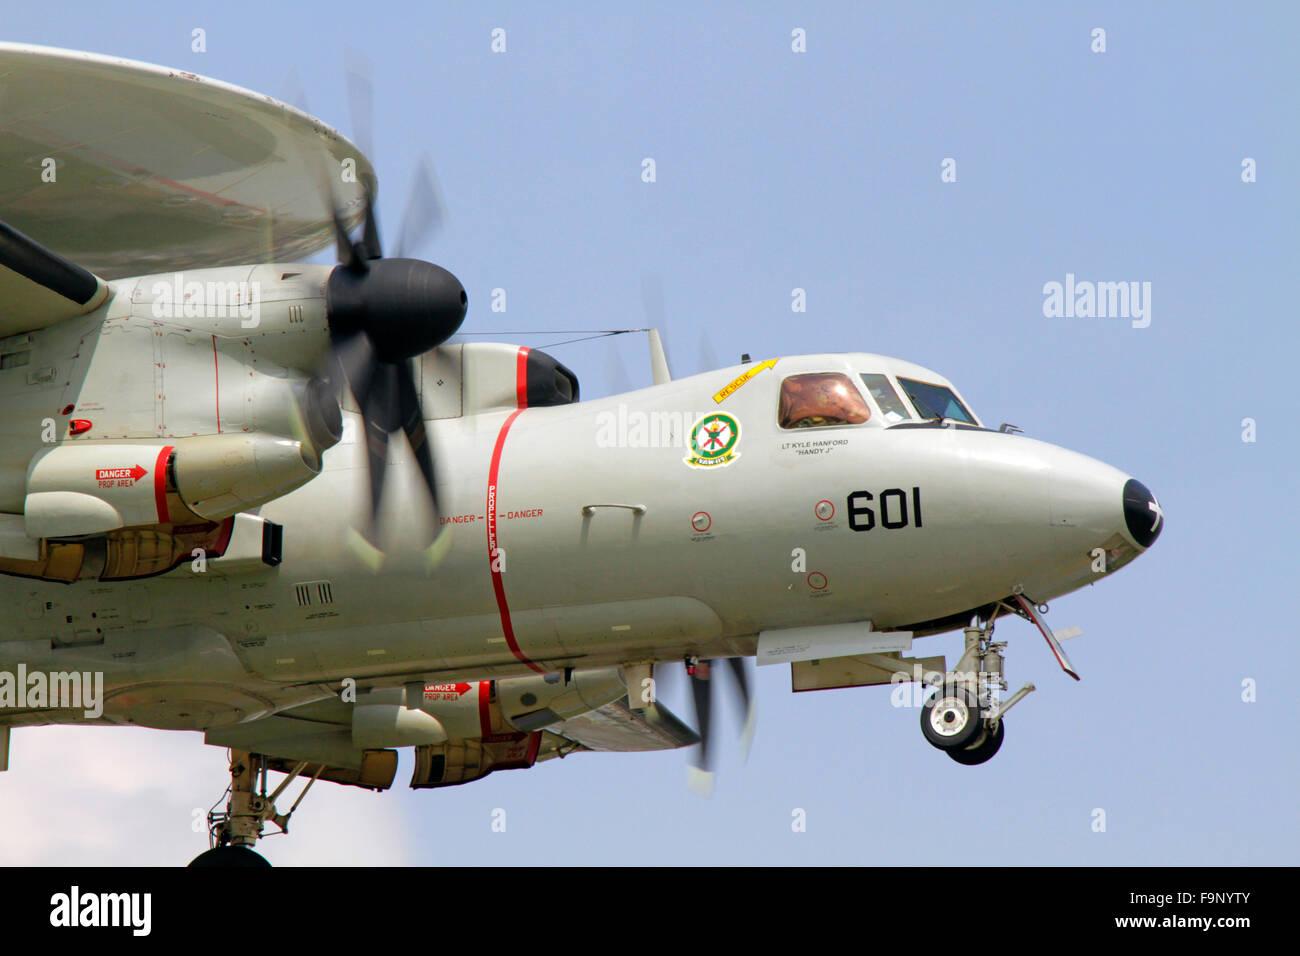 Northrop Grumman E-2D Advanced Hawkeye of US Navy - Stock Image